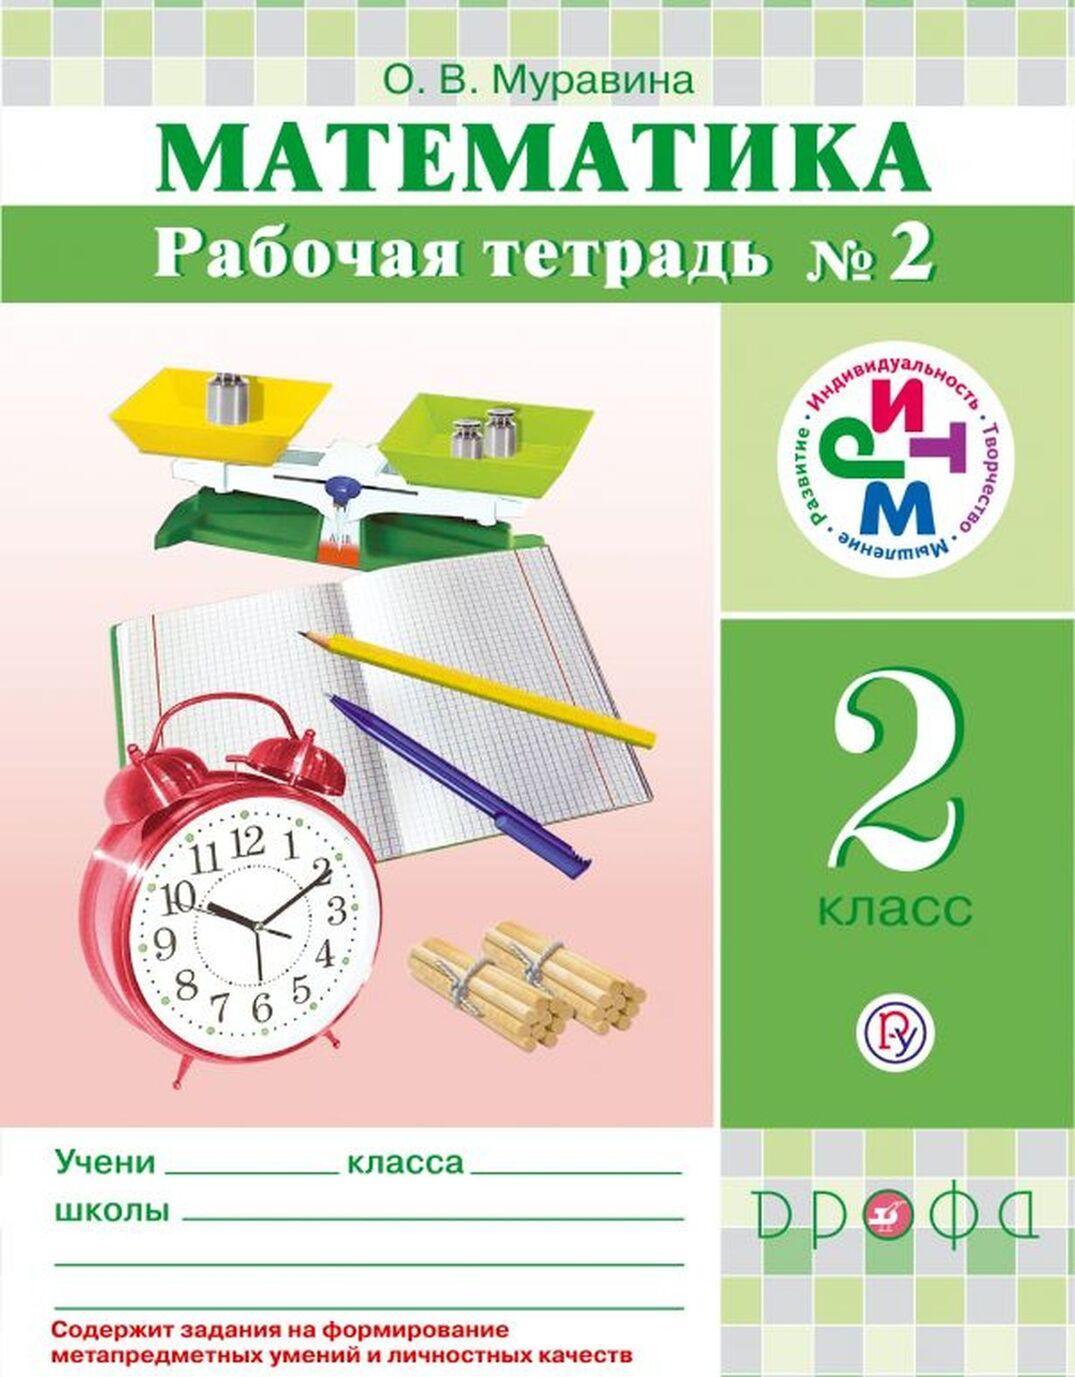 Matematika. 2 klass. Rabochaja tetrad № 2